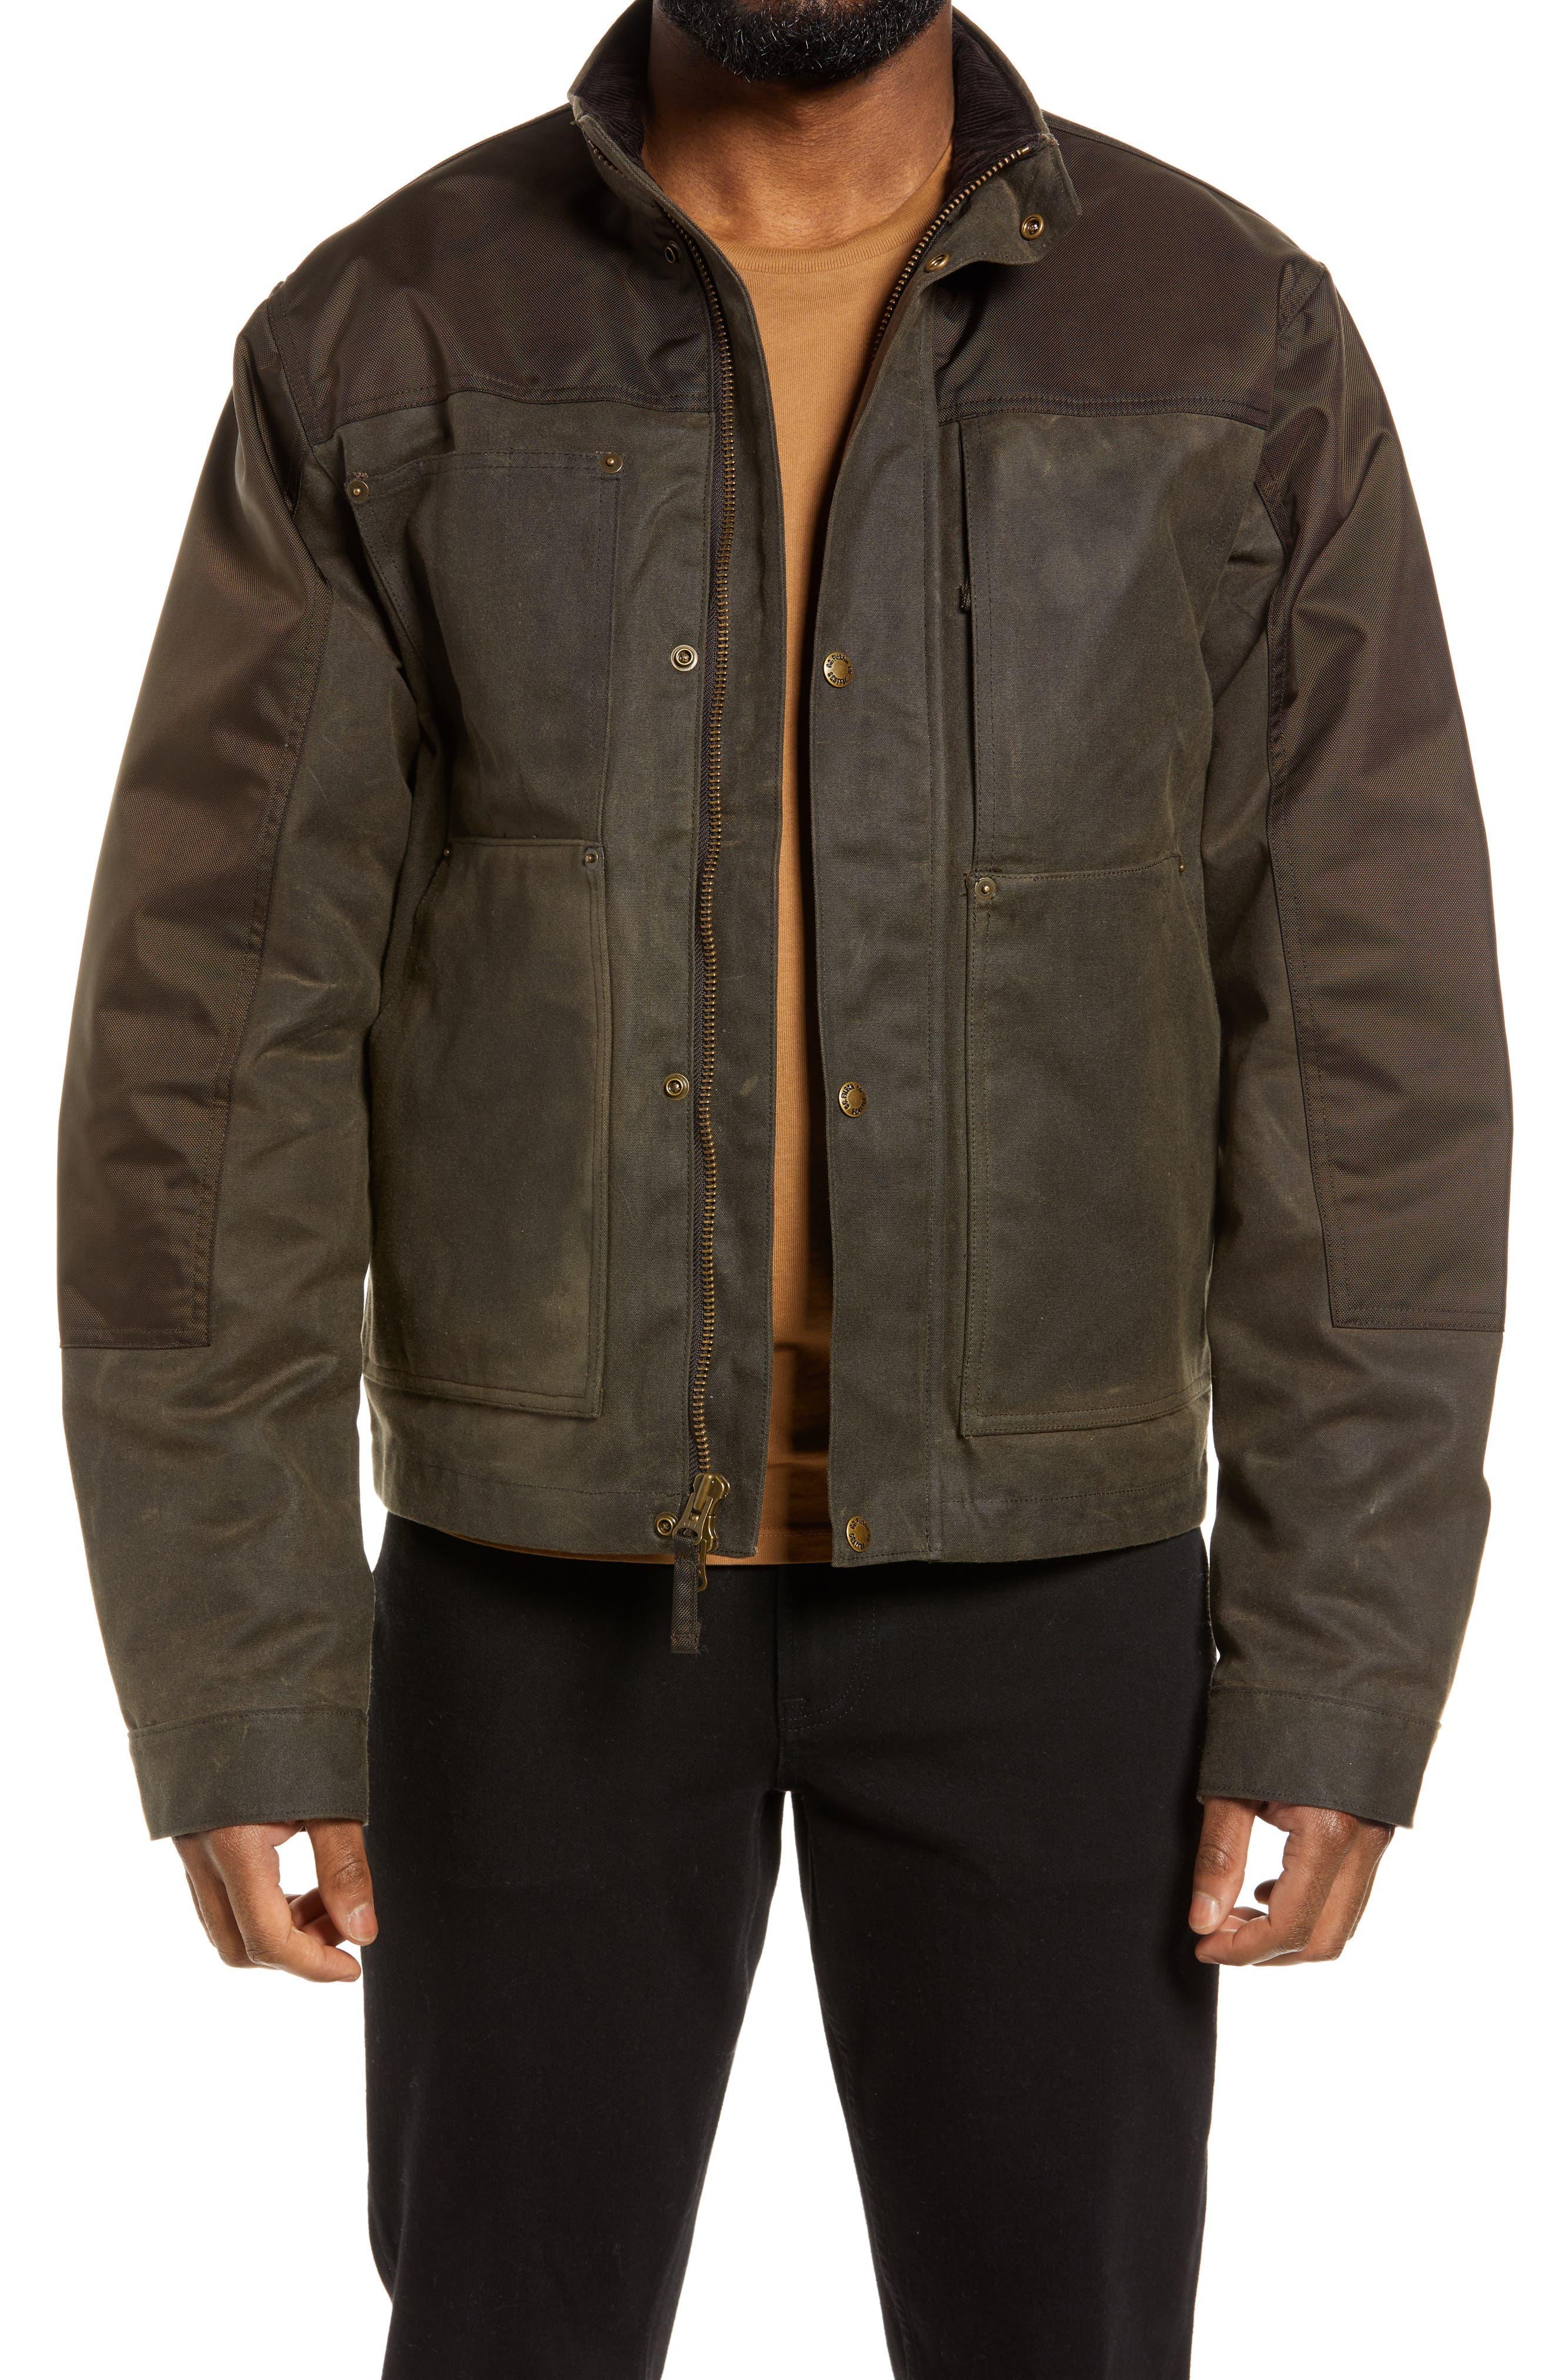 Alcan Waxed Cotton Cruiser Jacket